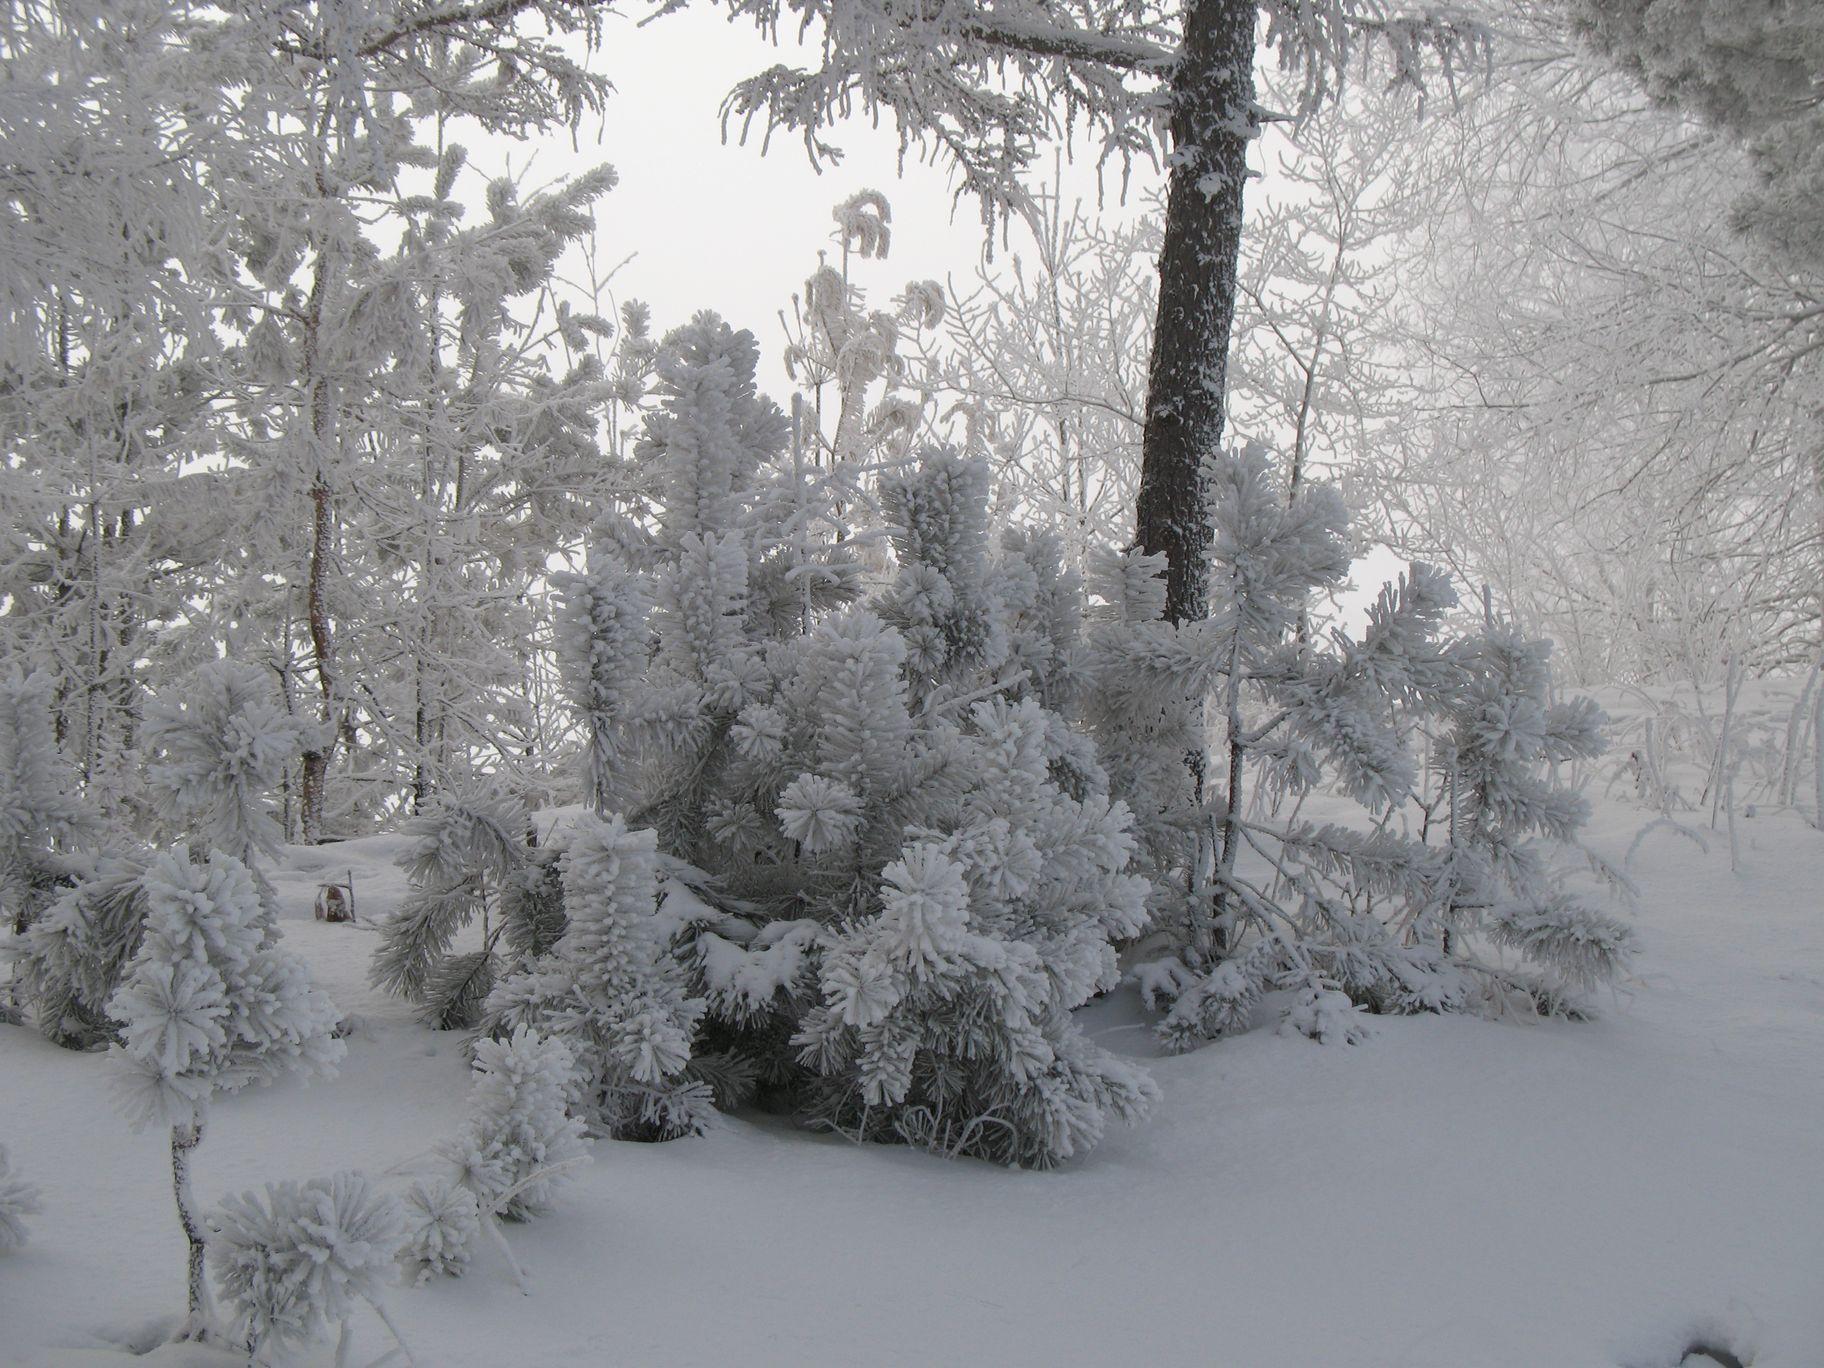 http://botsad-amur.ru/wp-content/uploads/2017/01/Снежное_кружево_фото_Бешецкой_А.А._result.jpg